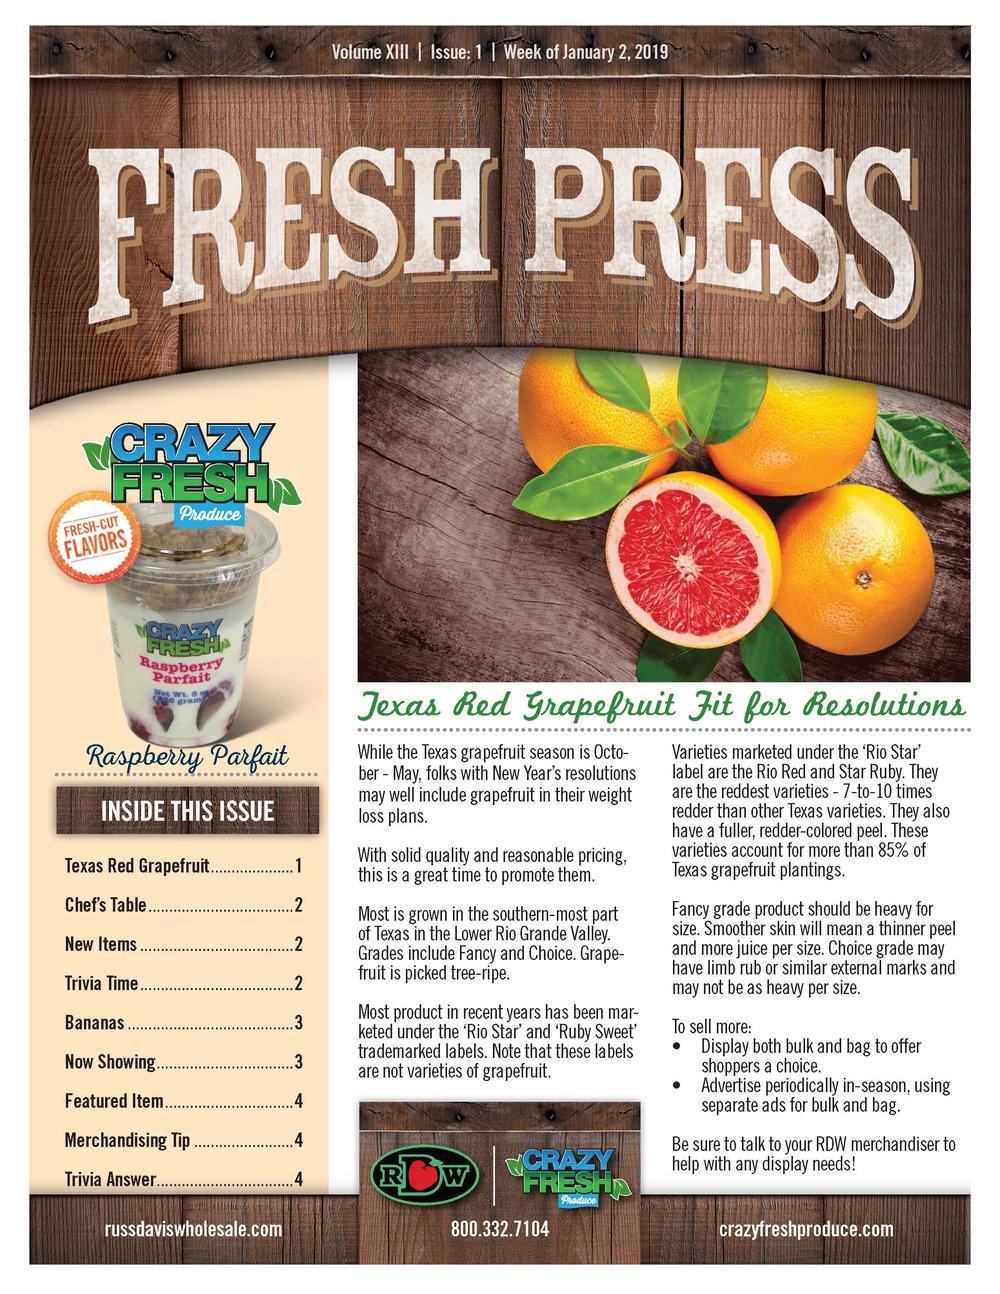 RDW_Fresh_Press_Jan2_2019_Page_1.jpg